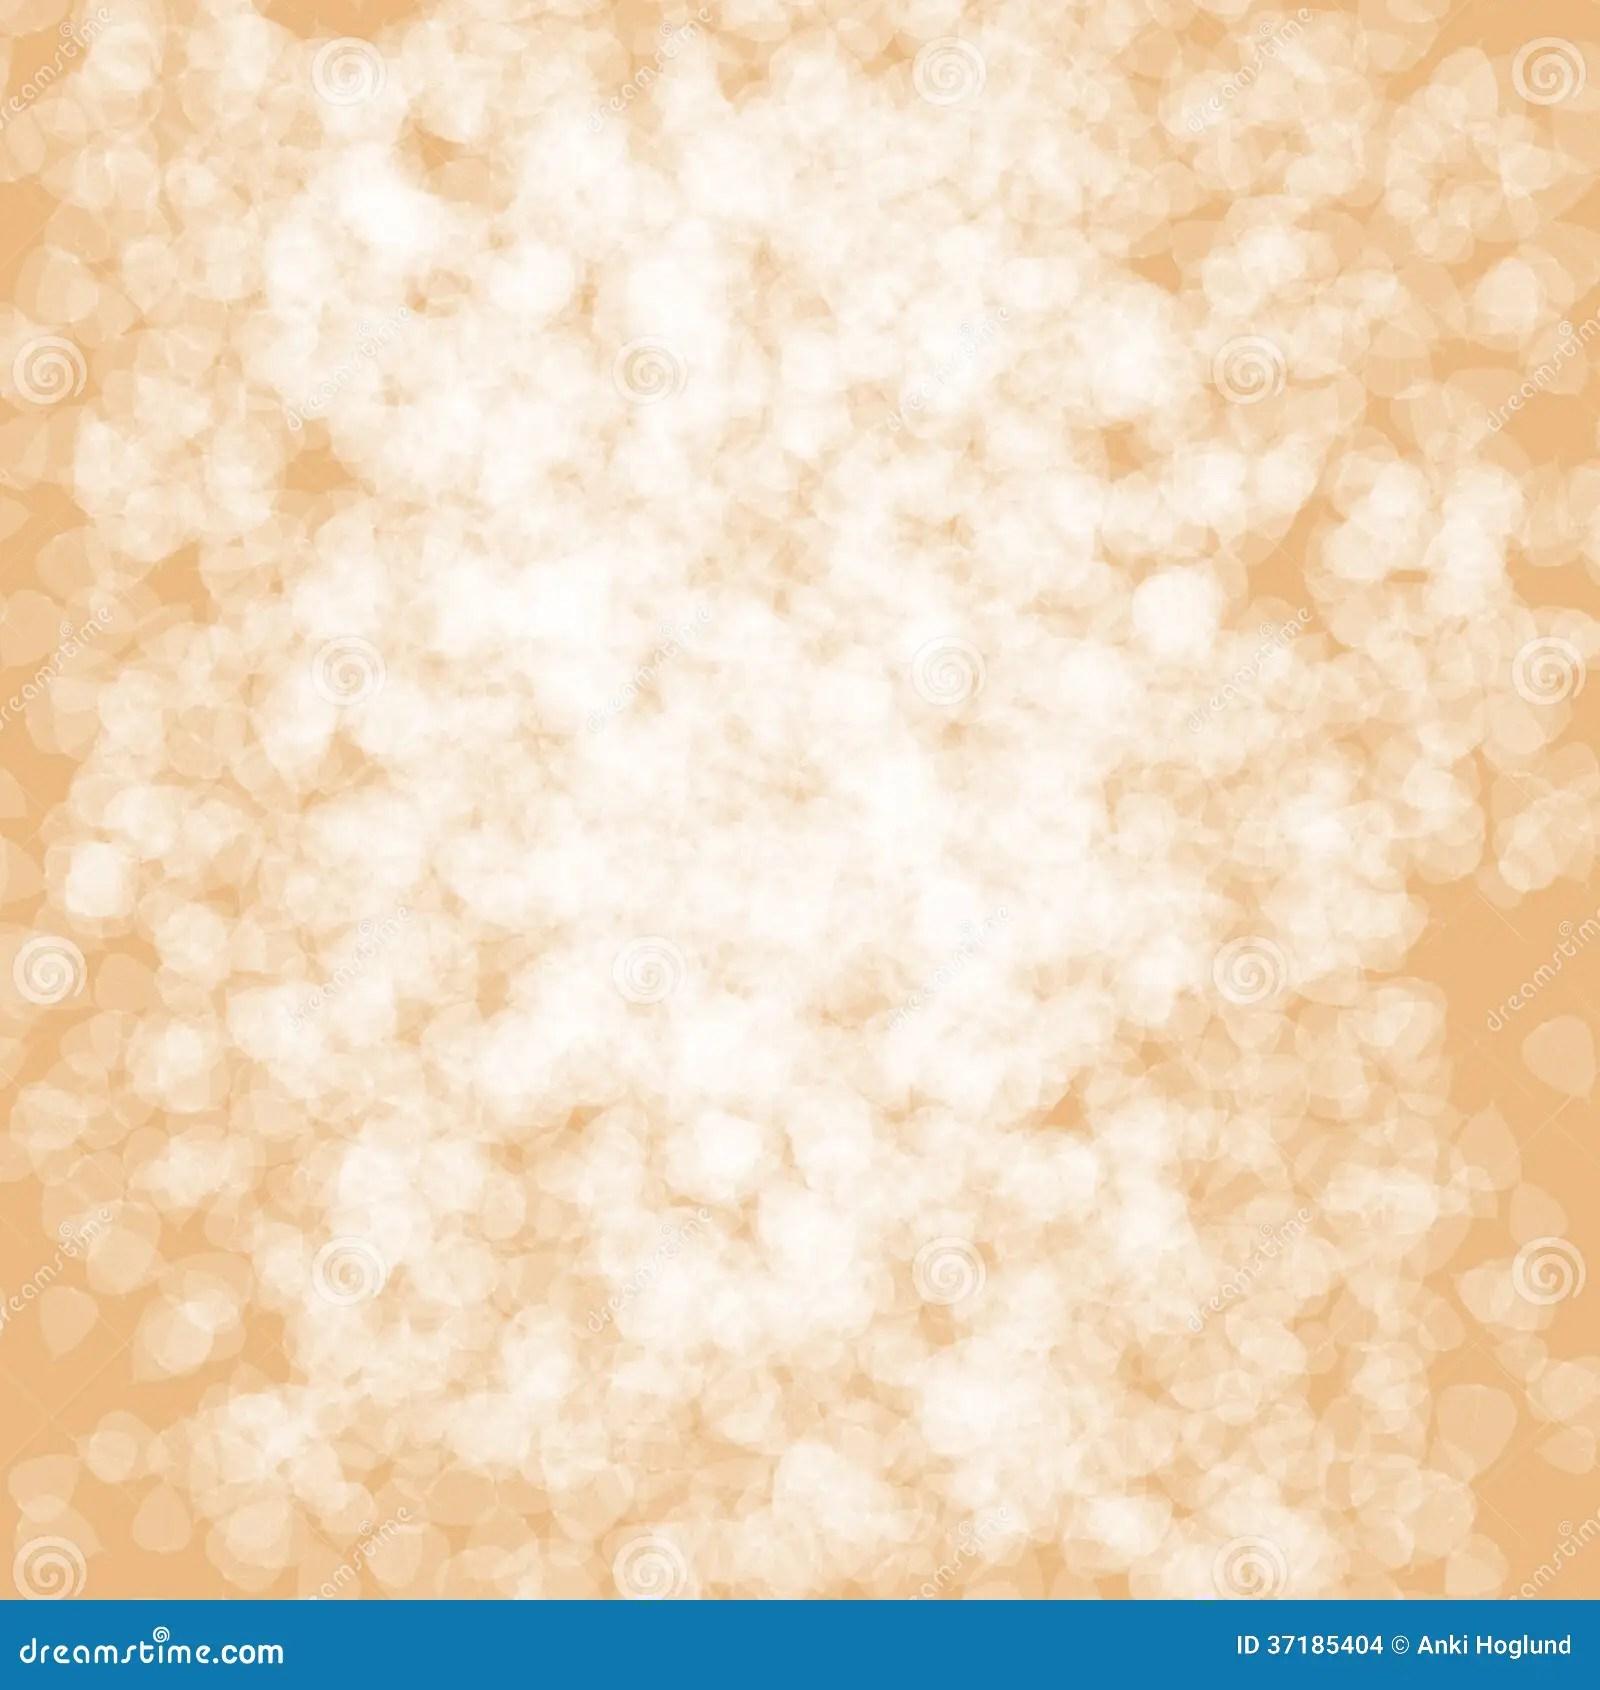 Bokeh Background Stock Images Image 37185404